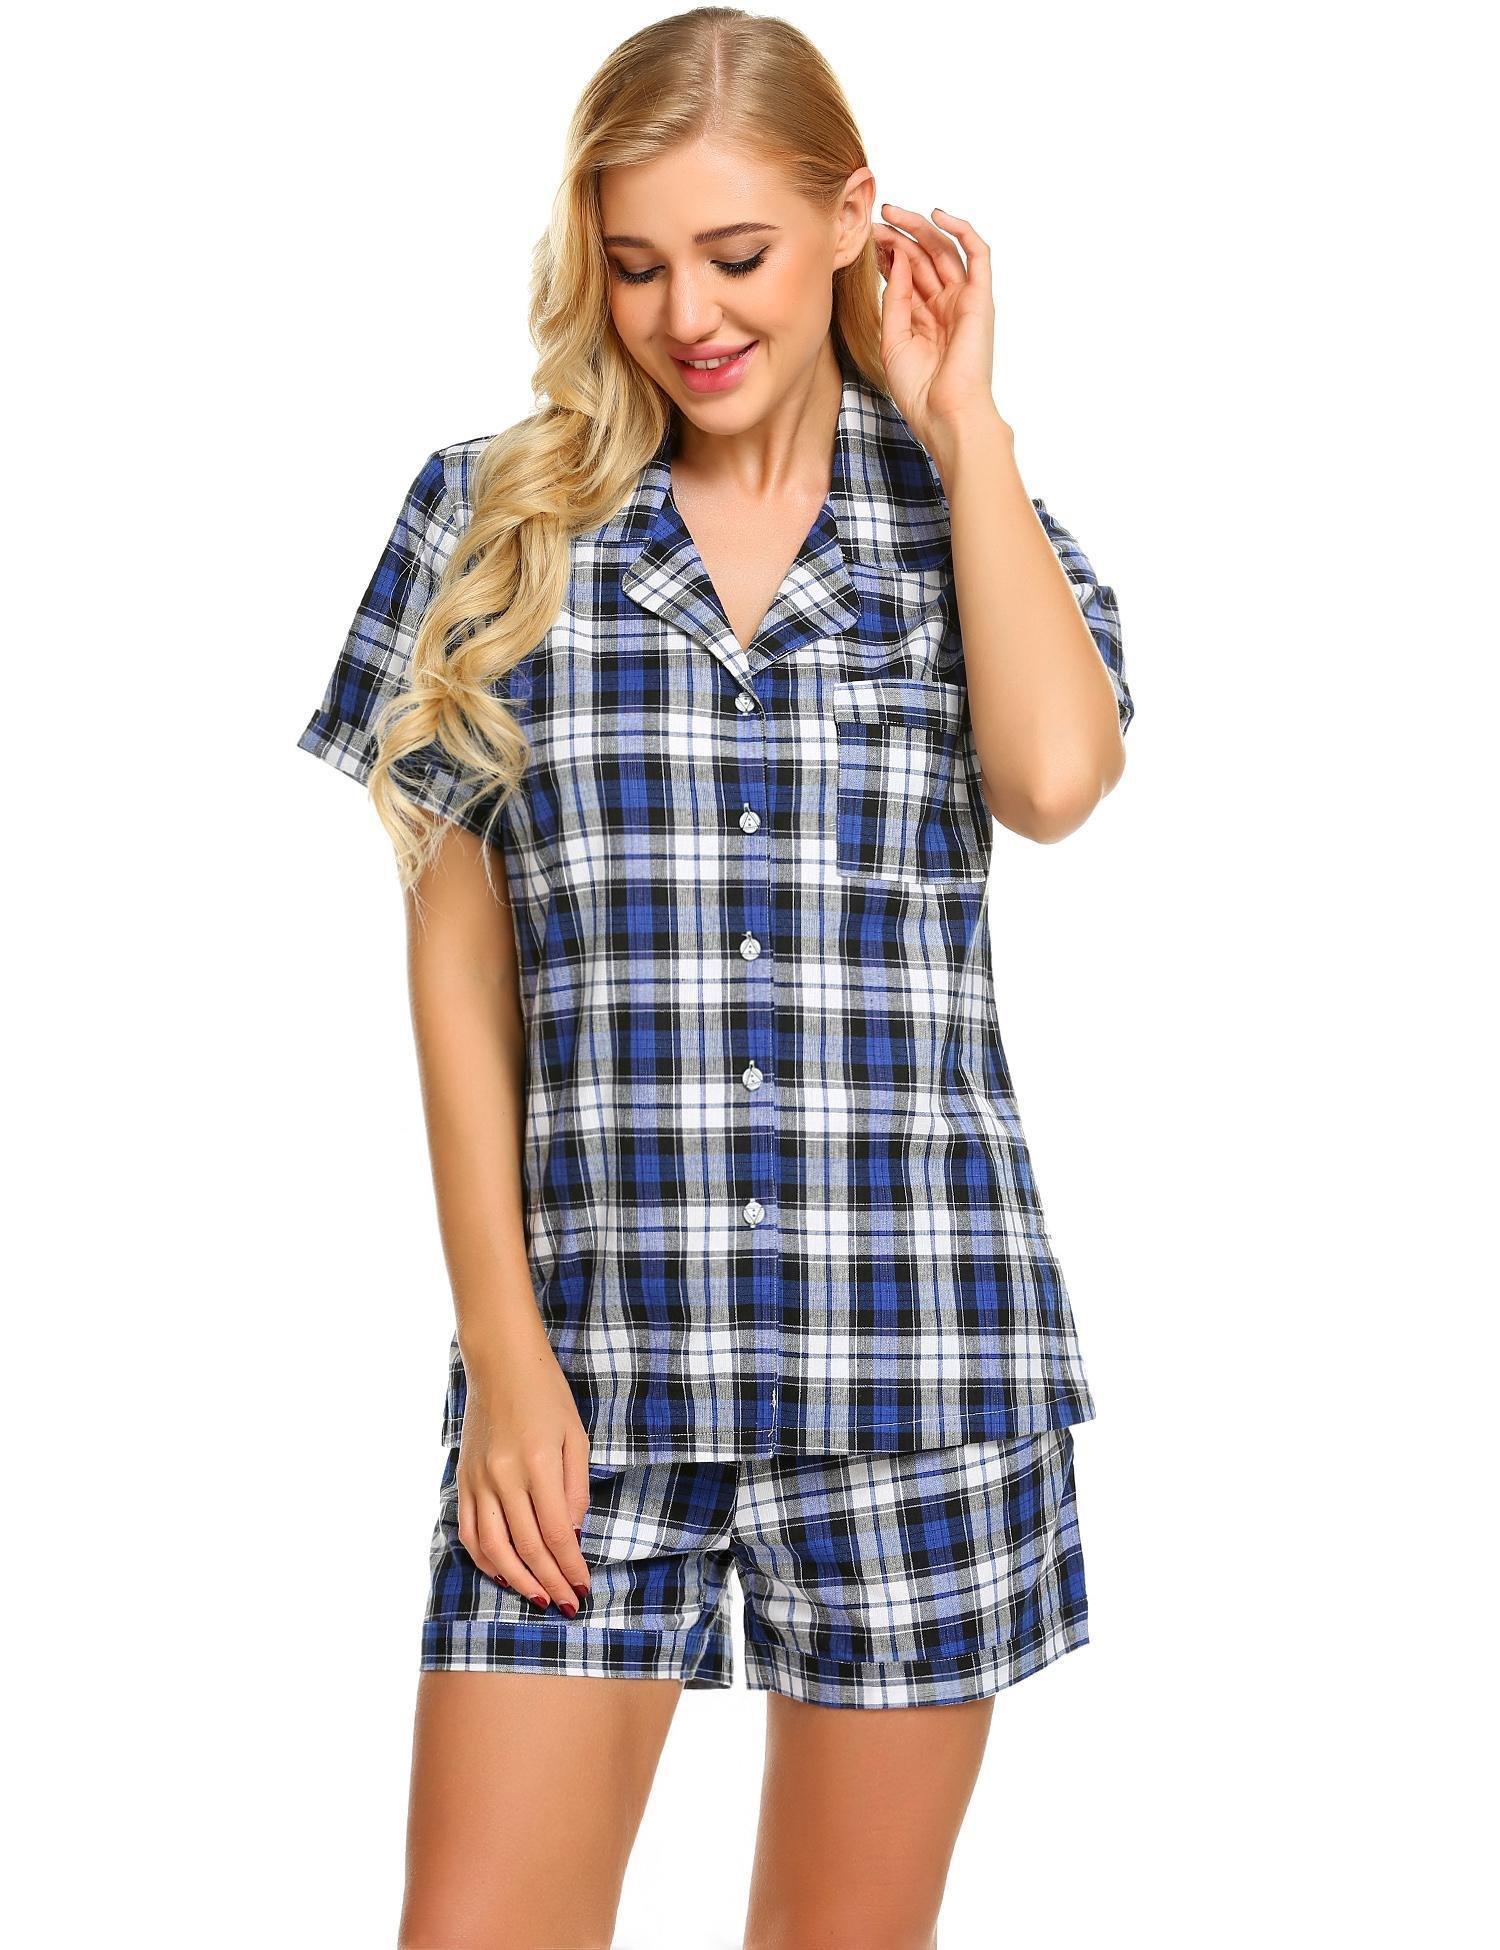 Skylin Womens Short Sleeve Cotton Pajamas Set Button Down Sleepwear Two  Piece PJ Set (Blue e181ca10a